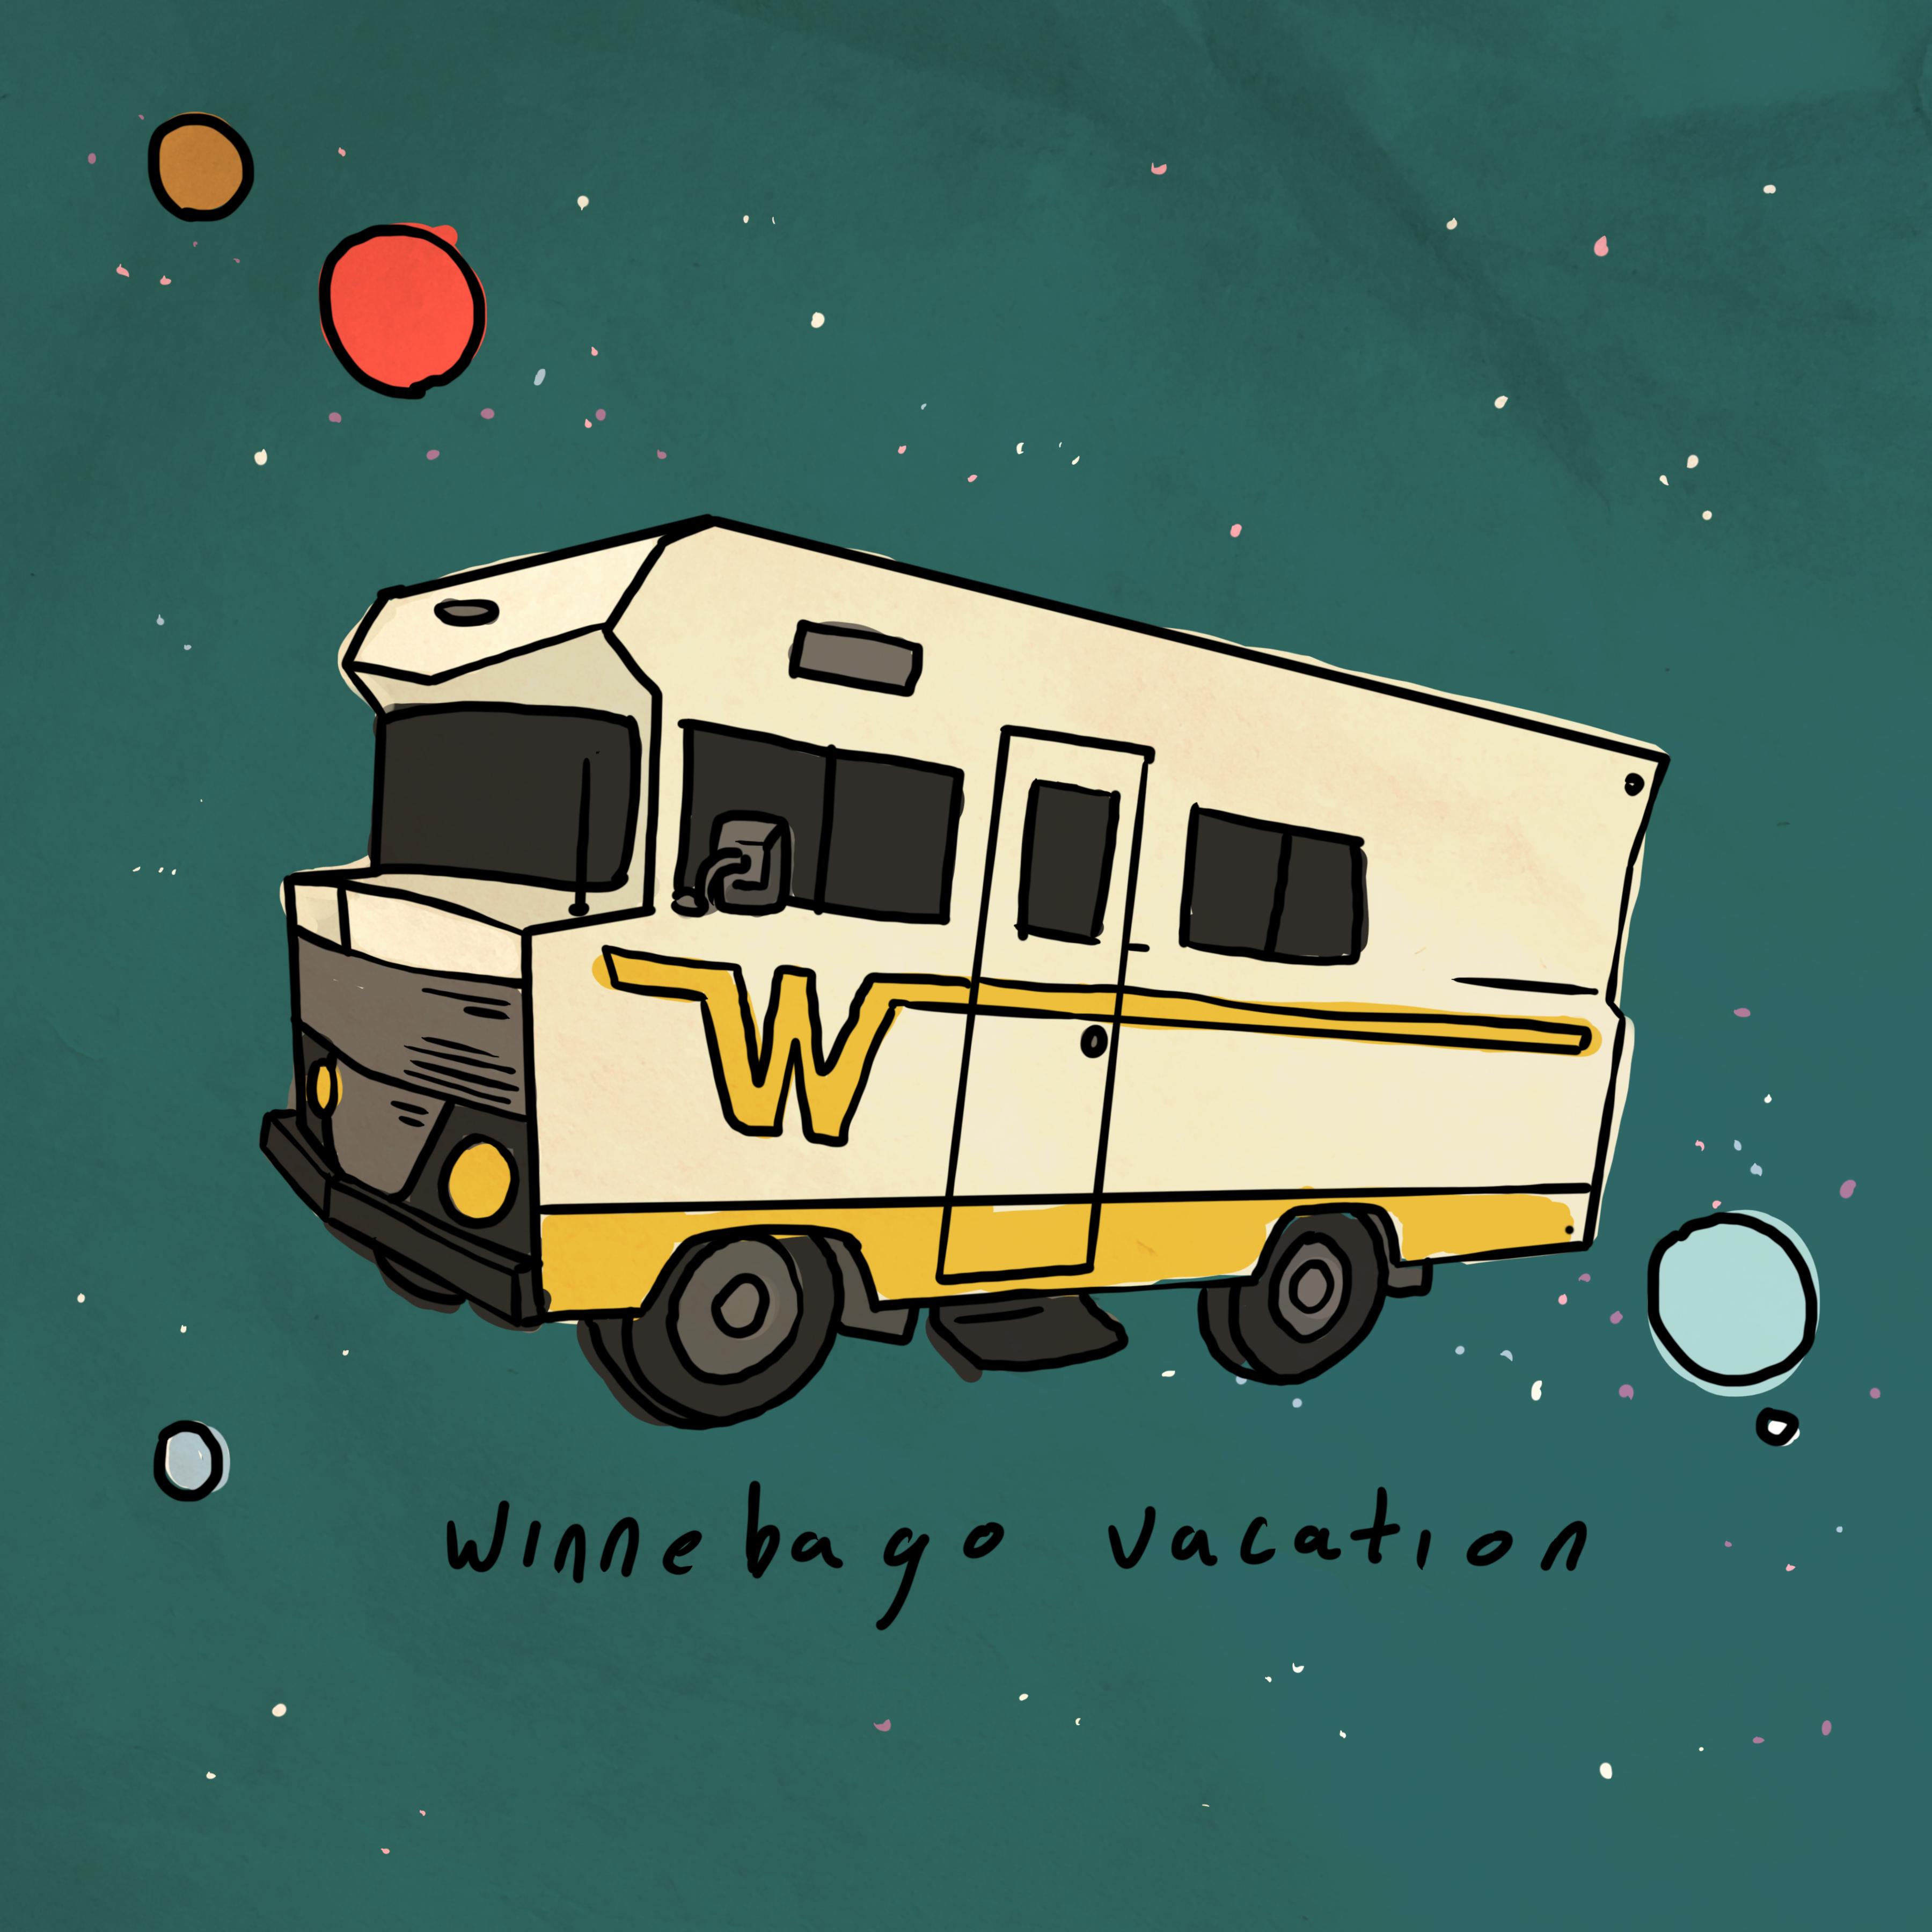 Winnebago Vacation - S/T